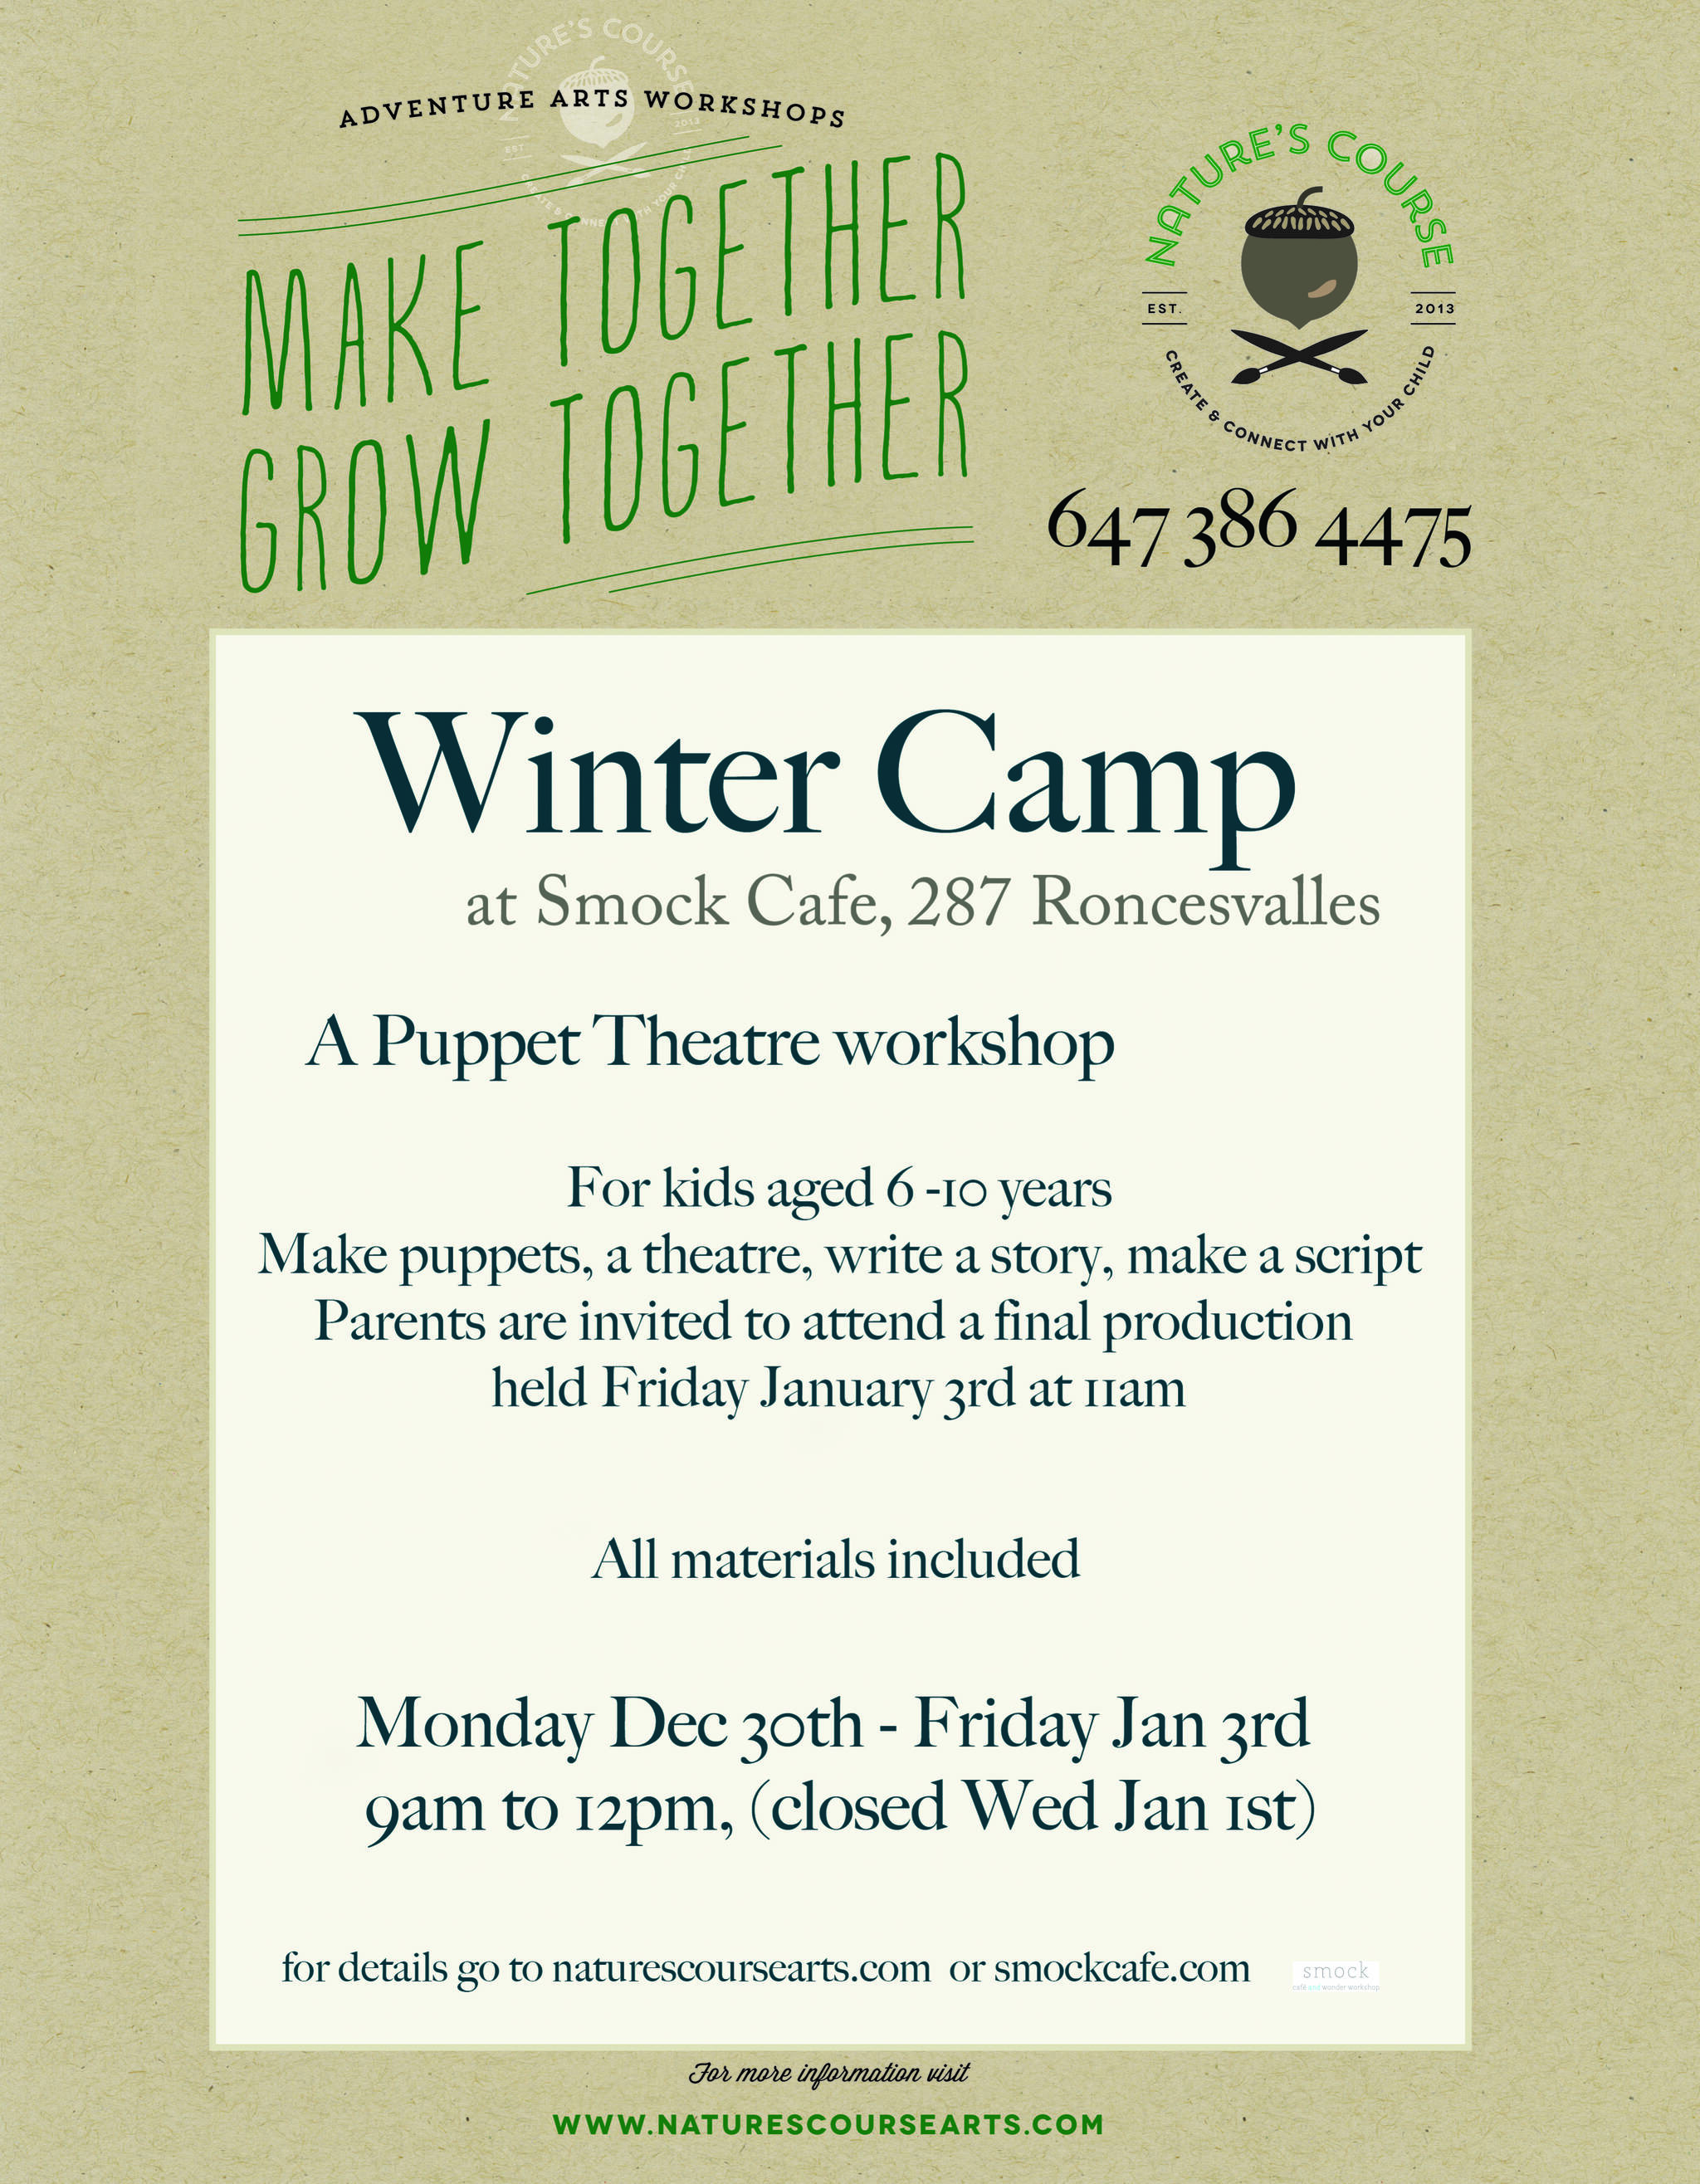 Puppet Theatre Winter Camp 9AM - 12PM